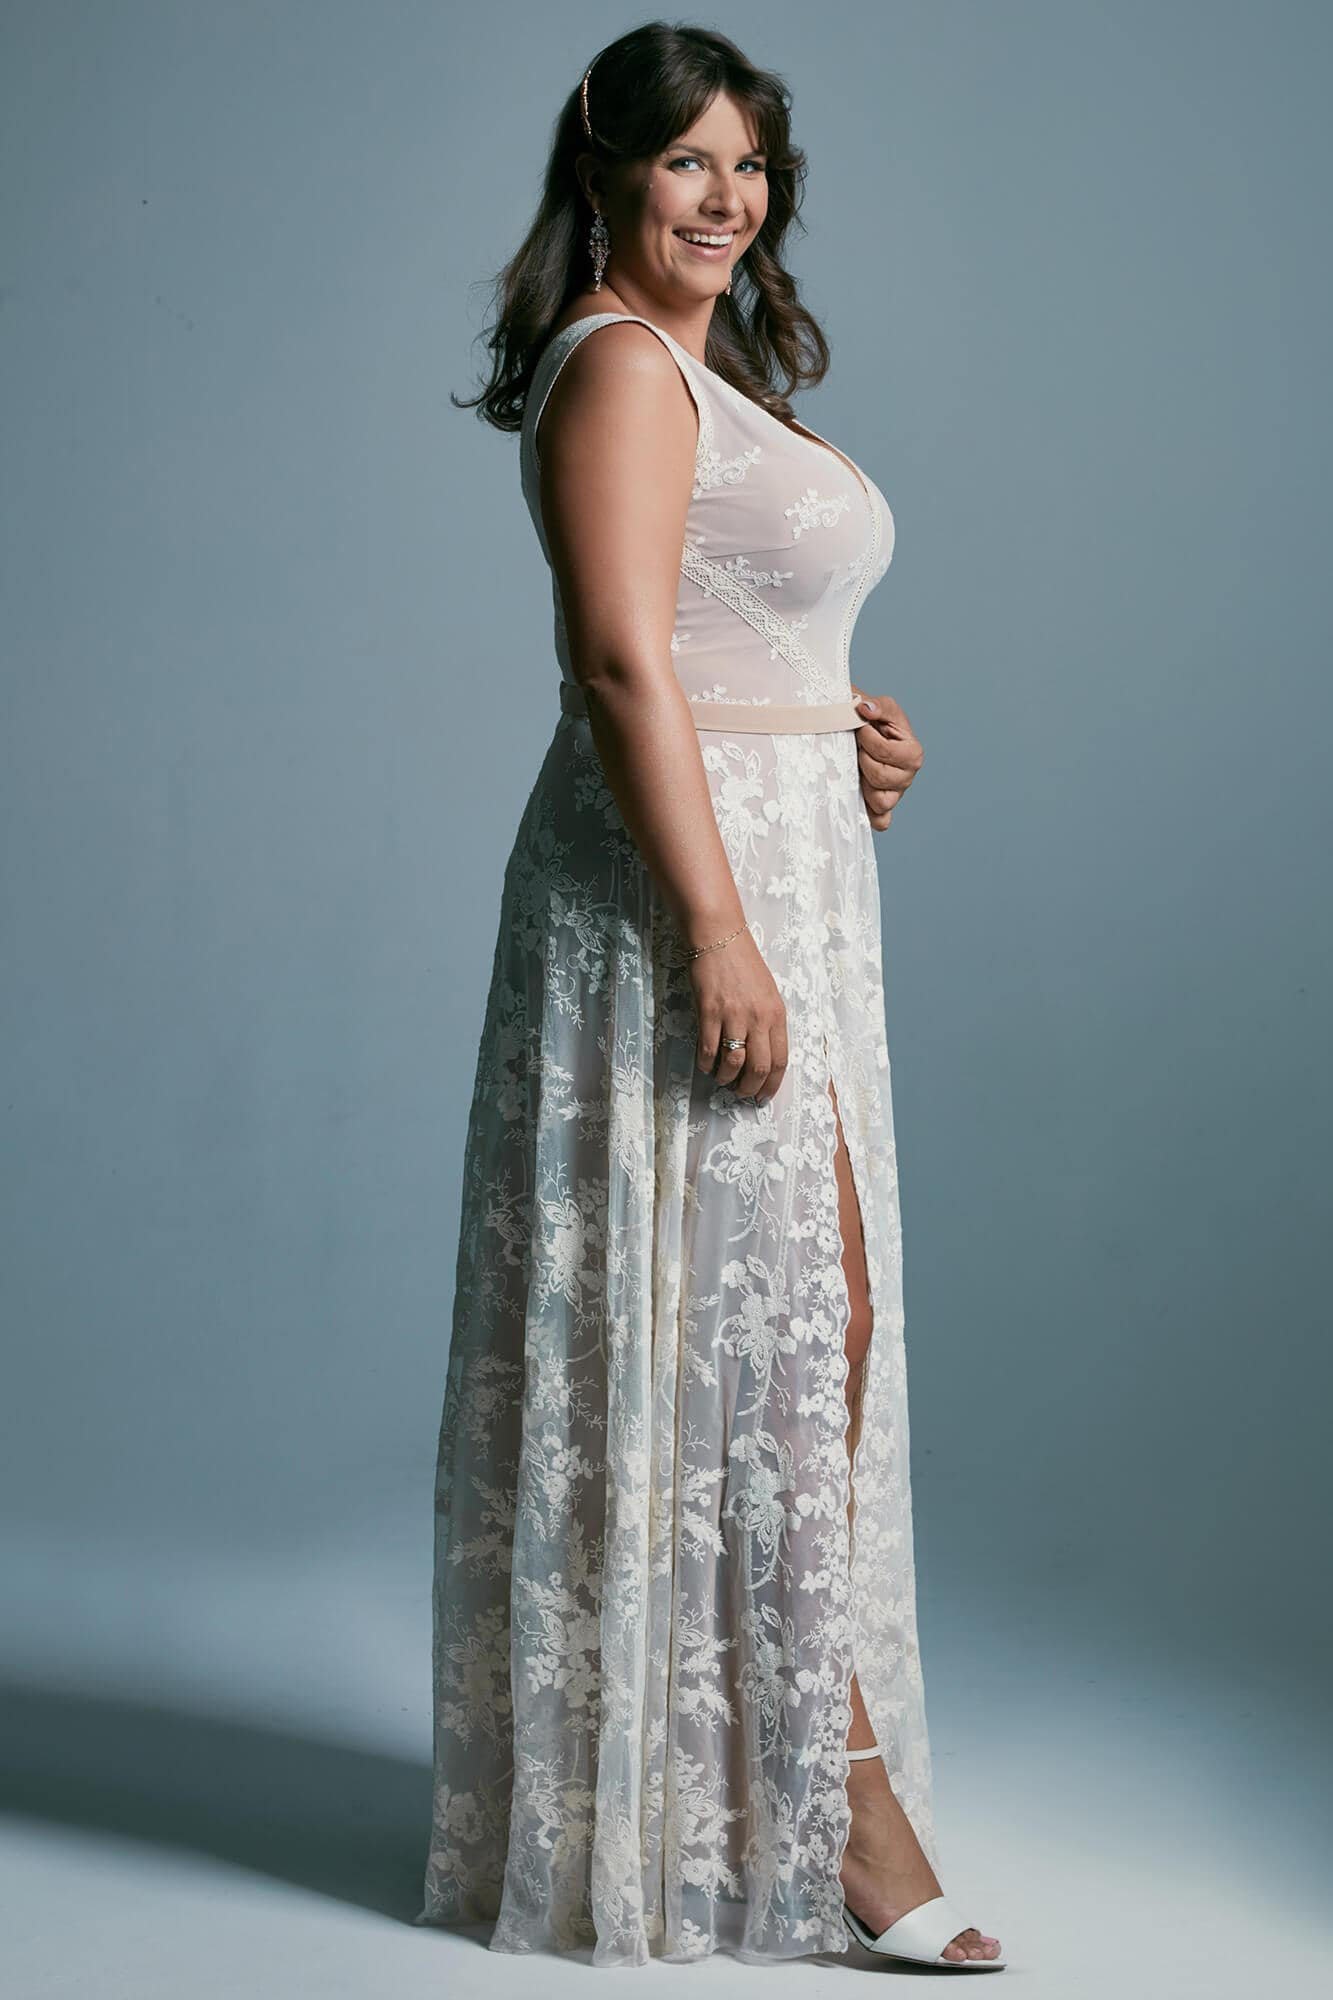 Sensual plus size wedding dress - beige with a classic cut Barcelona 19 plus size